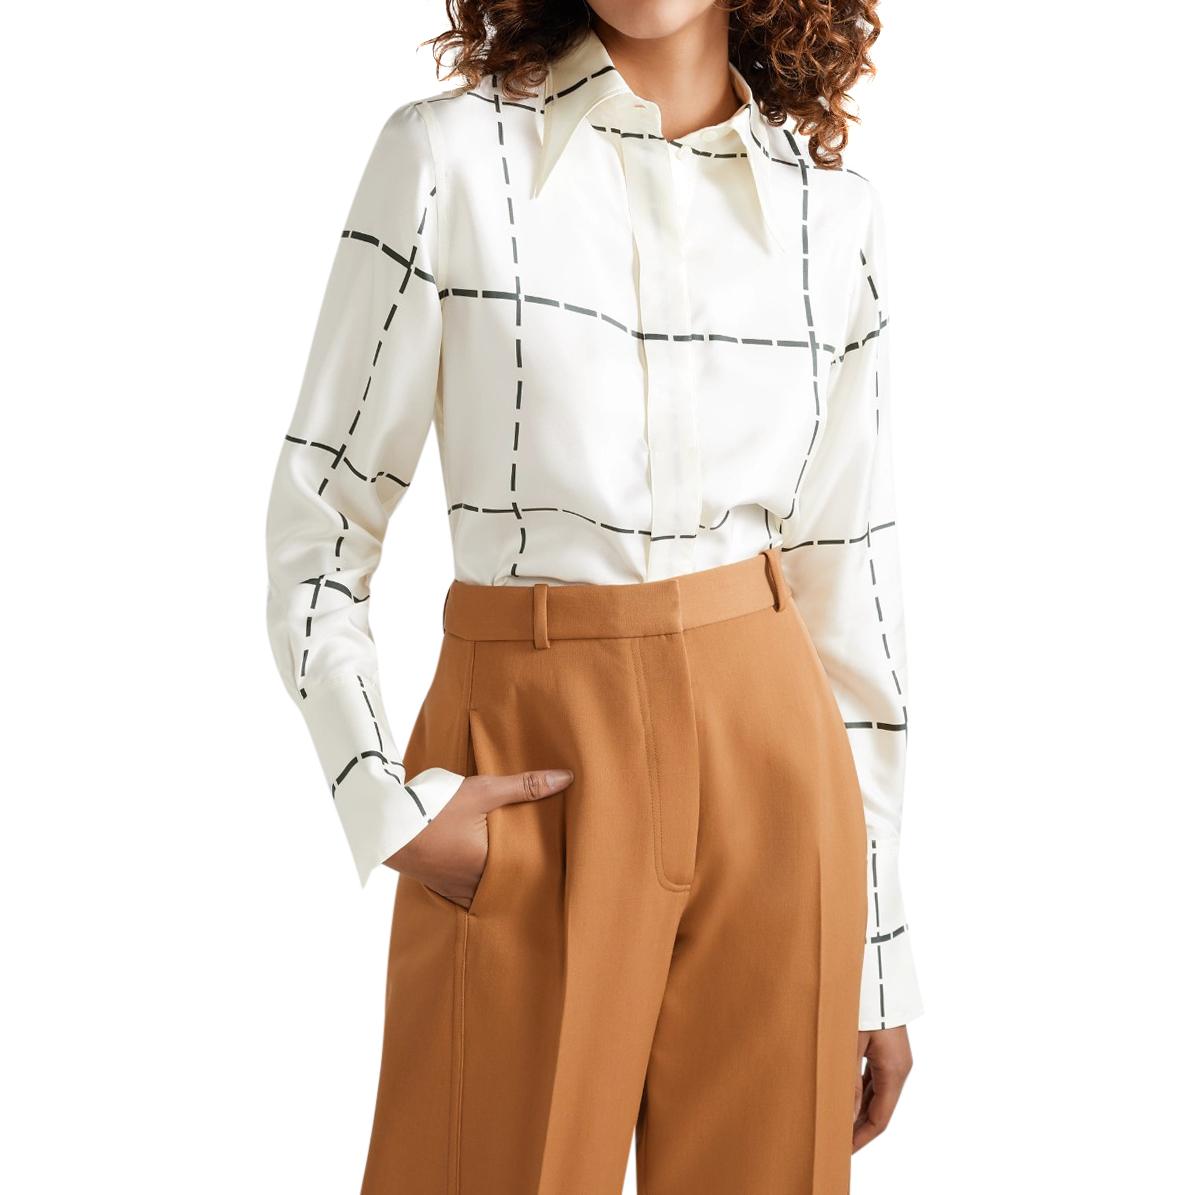 Victoria Beckham runway ivory silk twill blouse